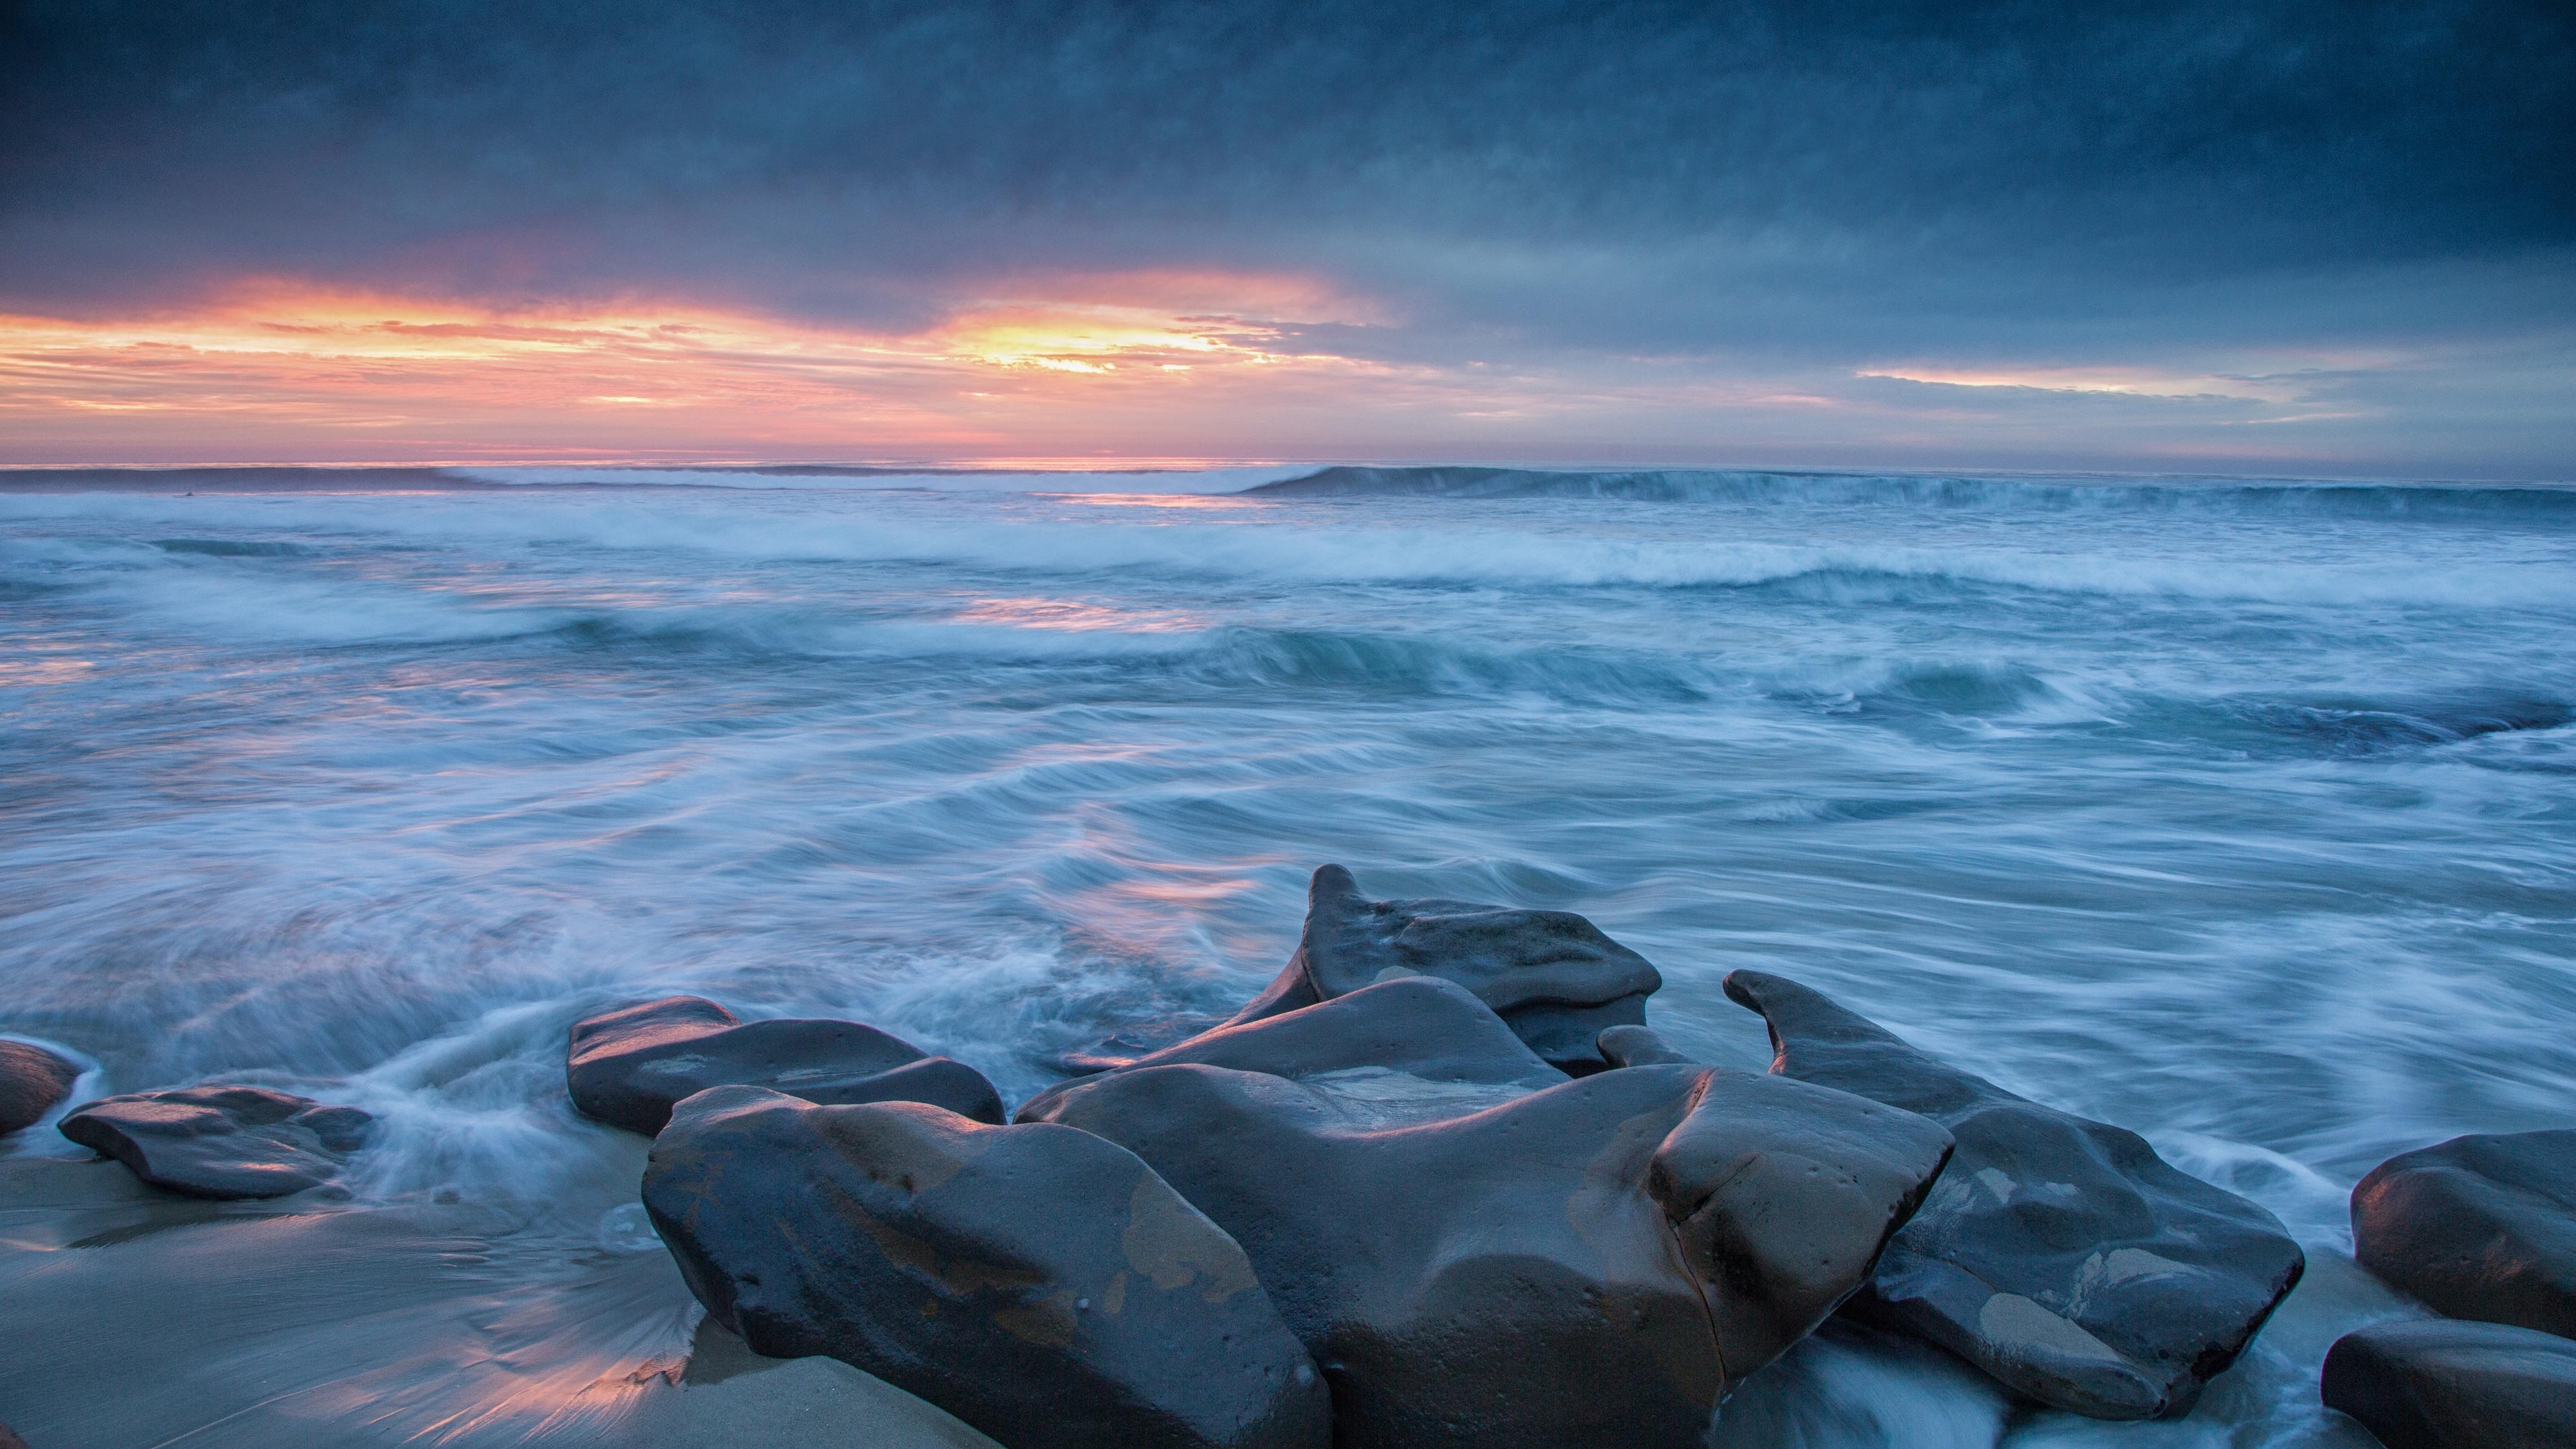 природа море горизонт камни облака небо скалы  № 432421 без смс